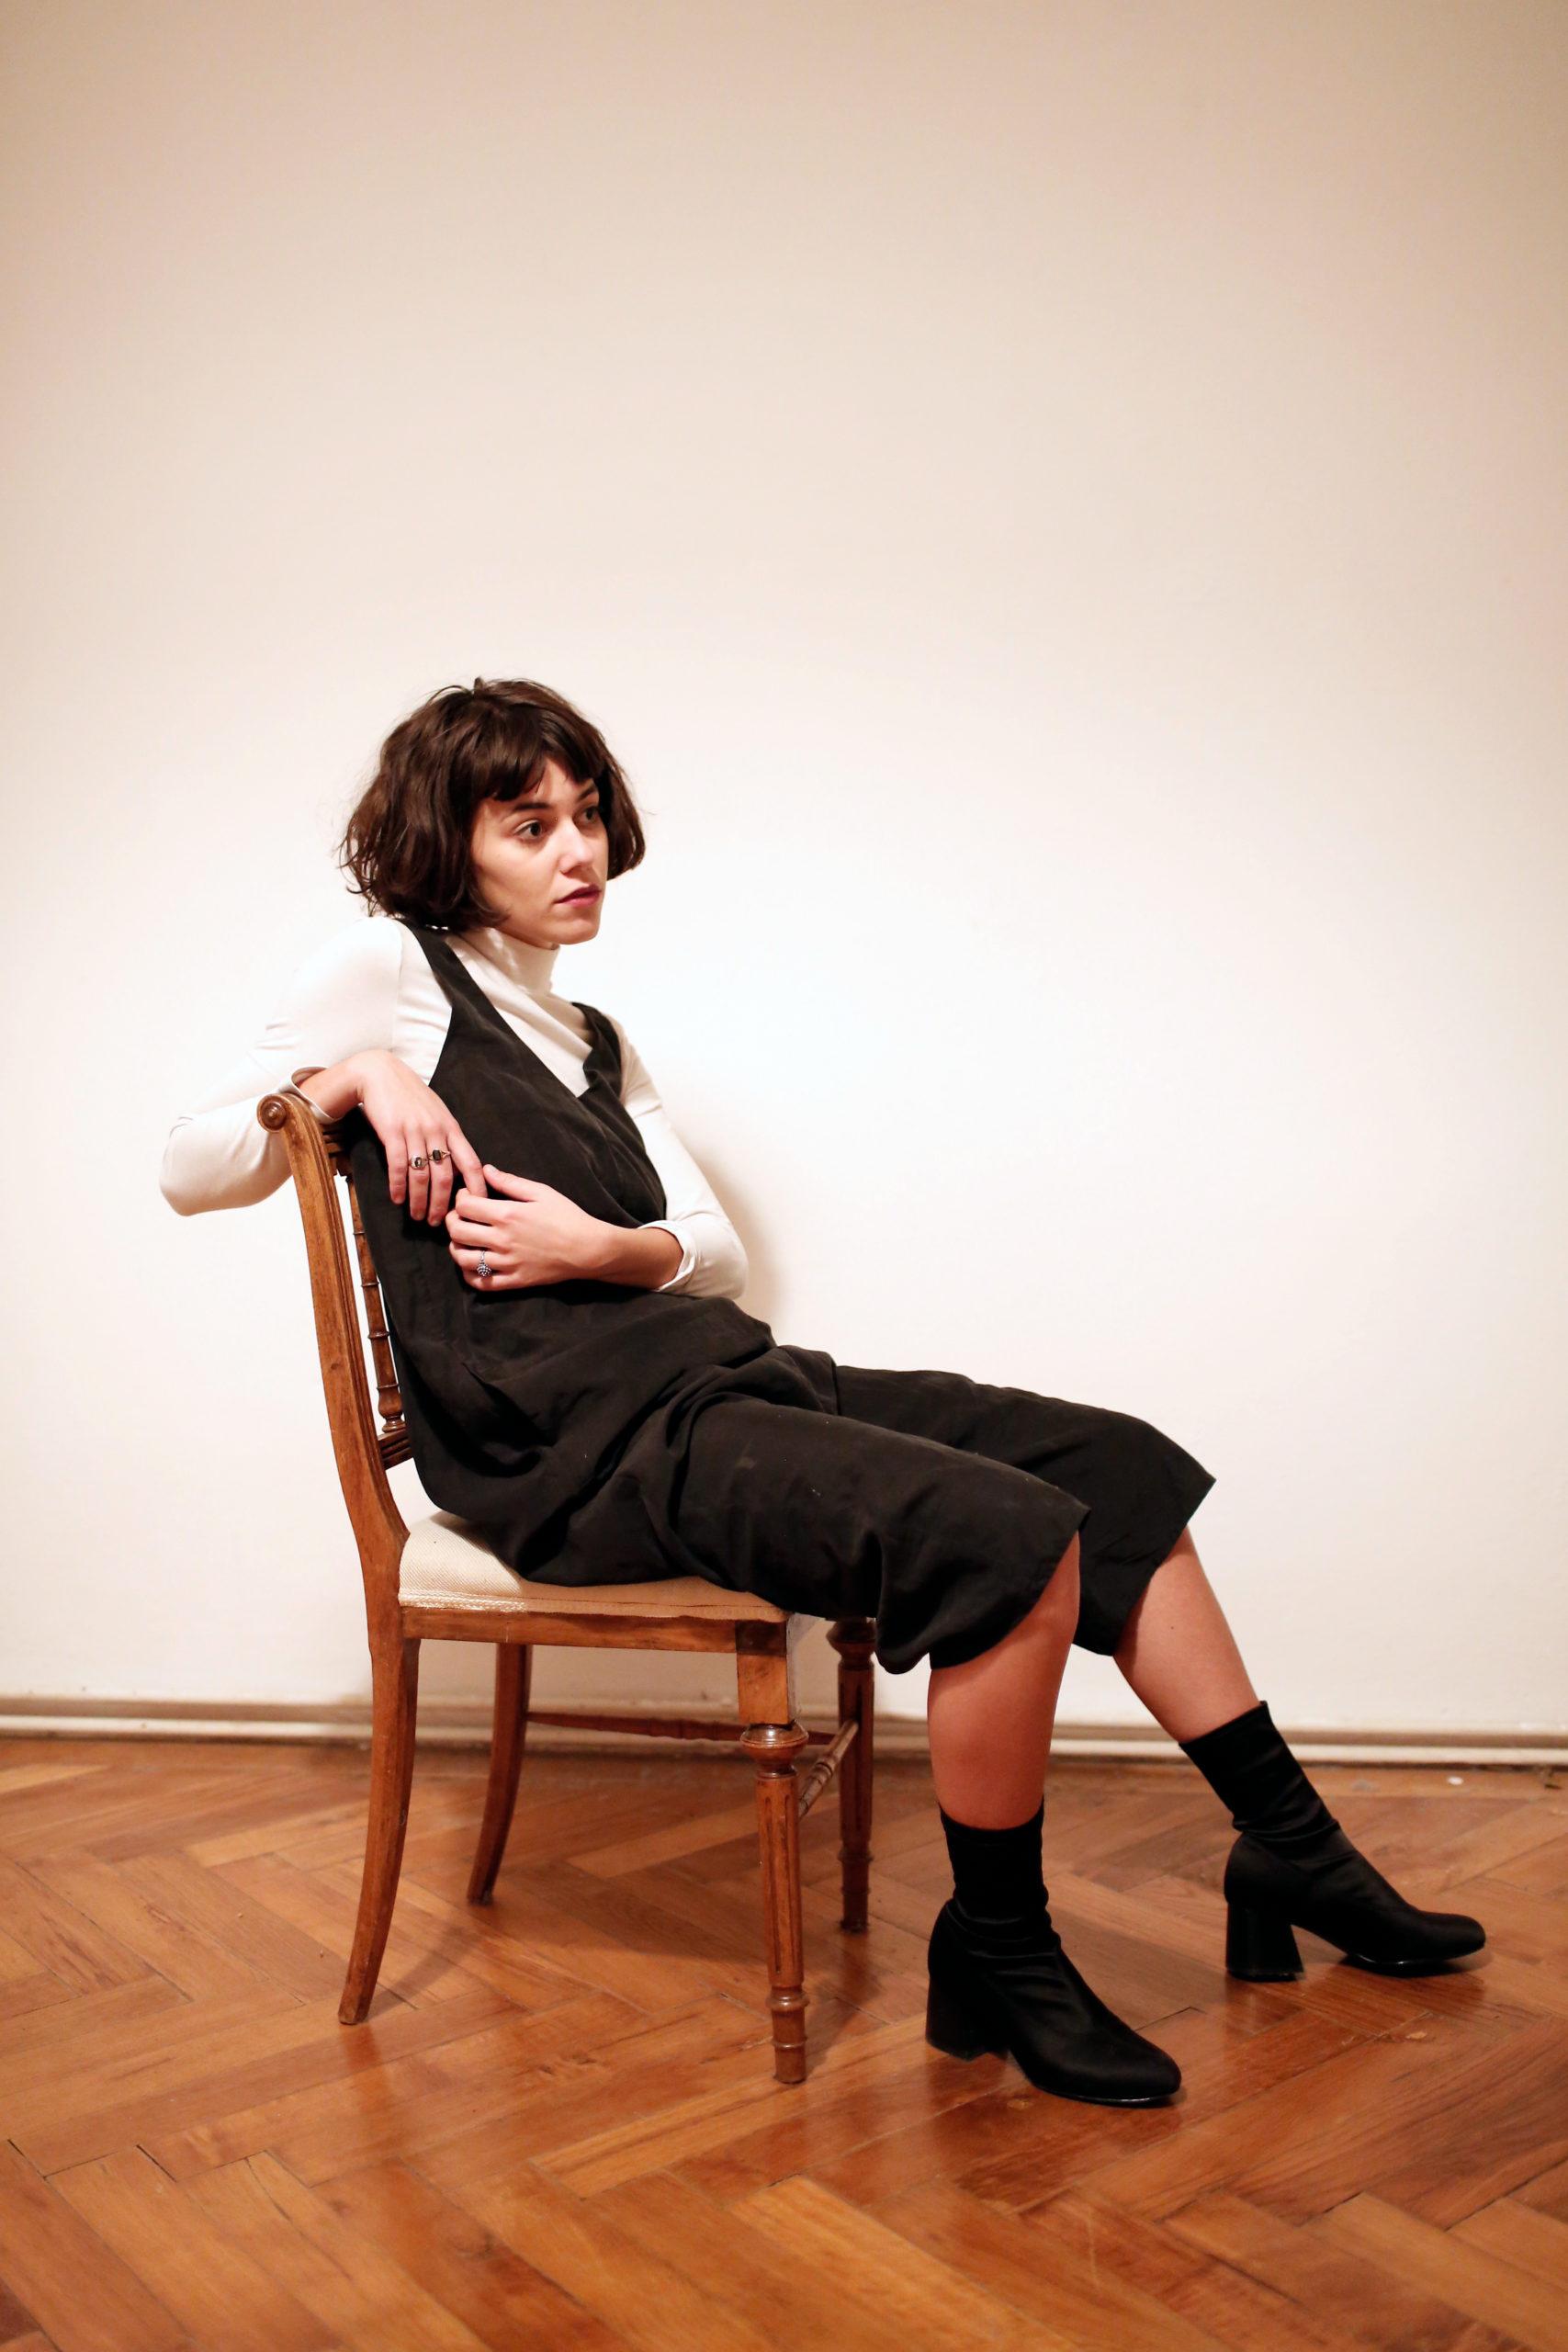 Chiara Bartl